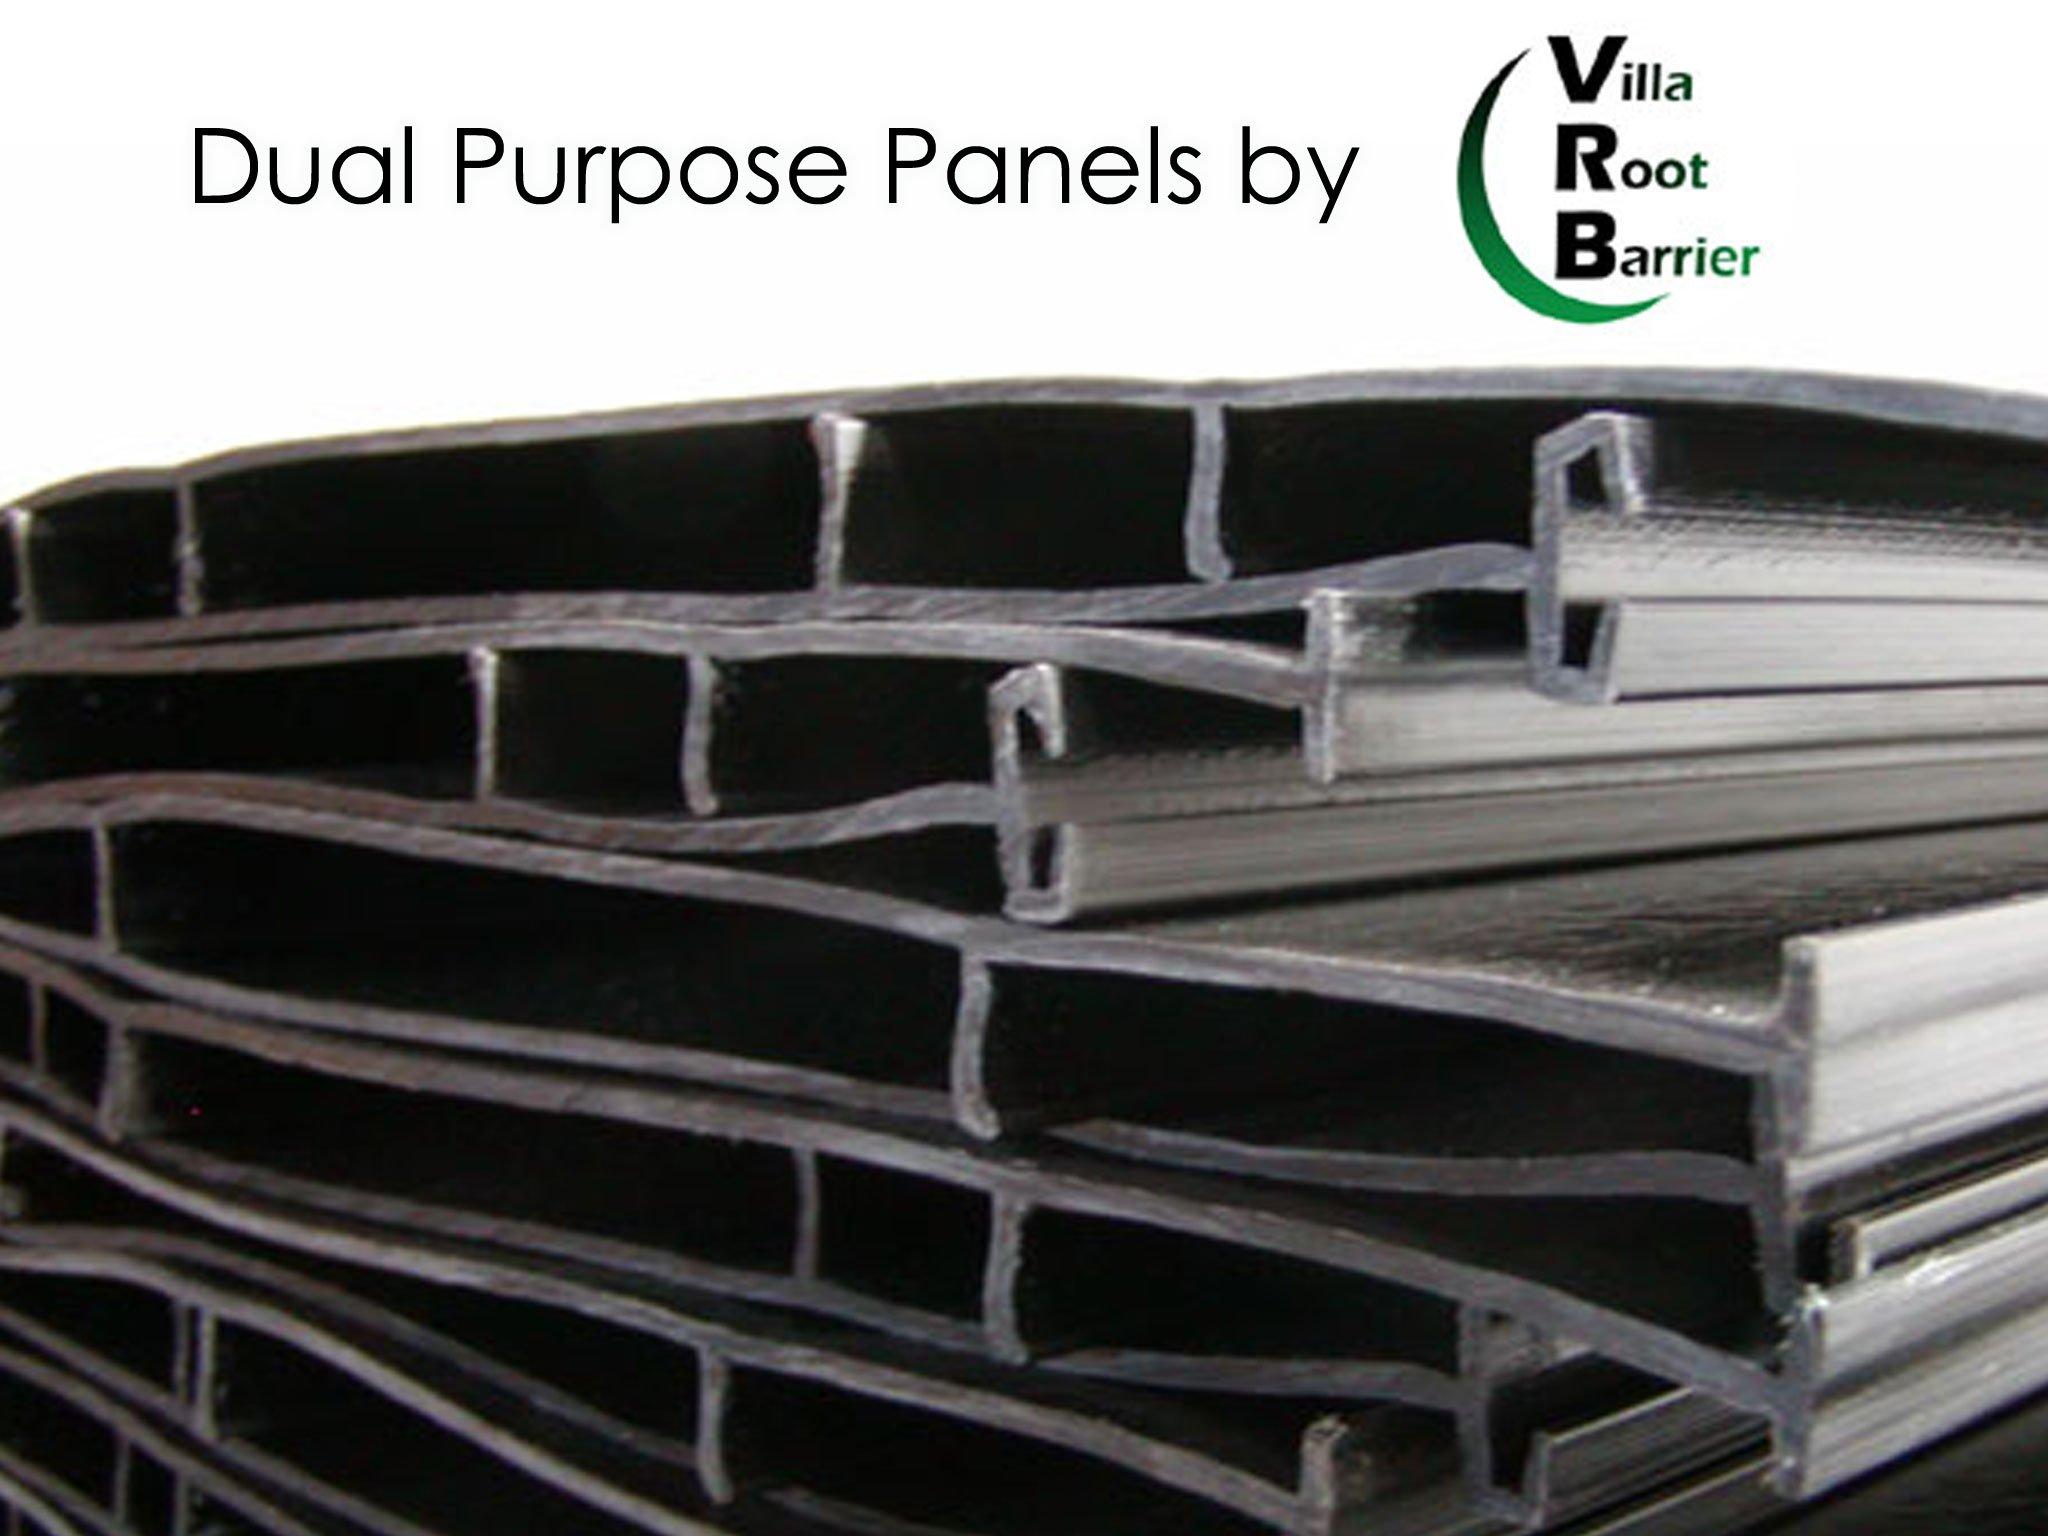 Villa Root Barrier Panels 48''x24''-10per Case- 20'